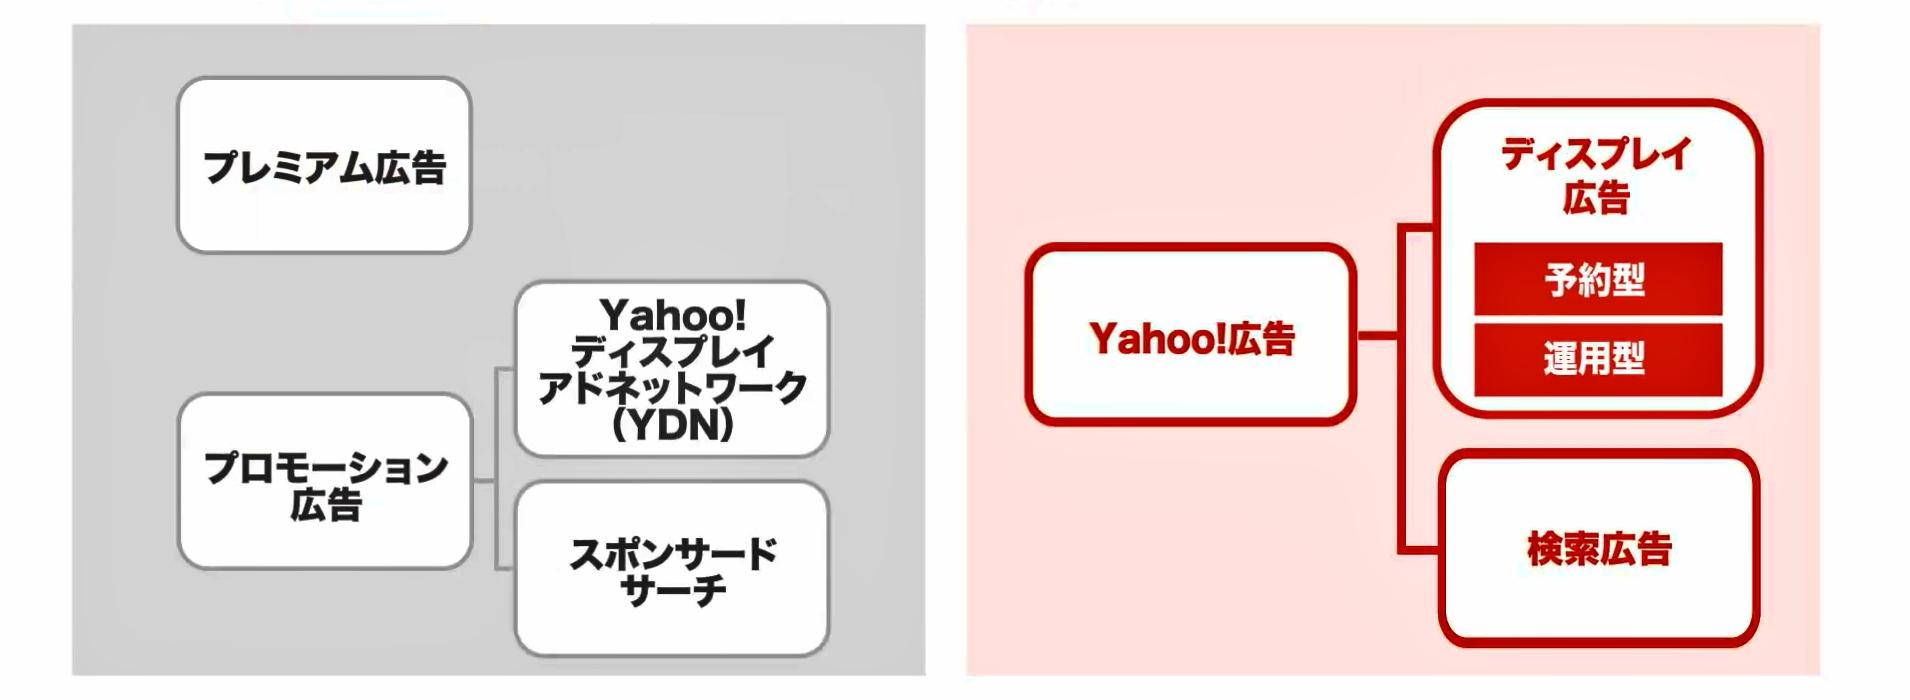 【Yahoo!広告 ディスプレイ広告(運用型)】~仕組み・概要と効果的な運用方法を元整備士が考察!~